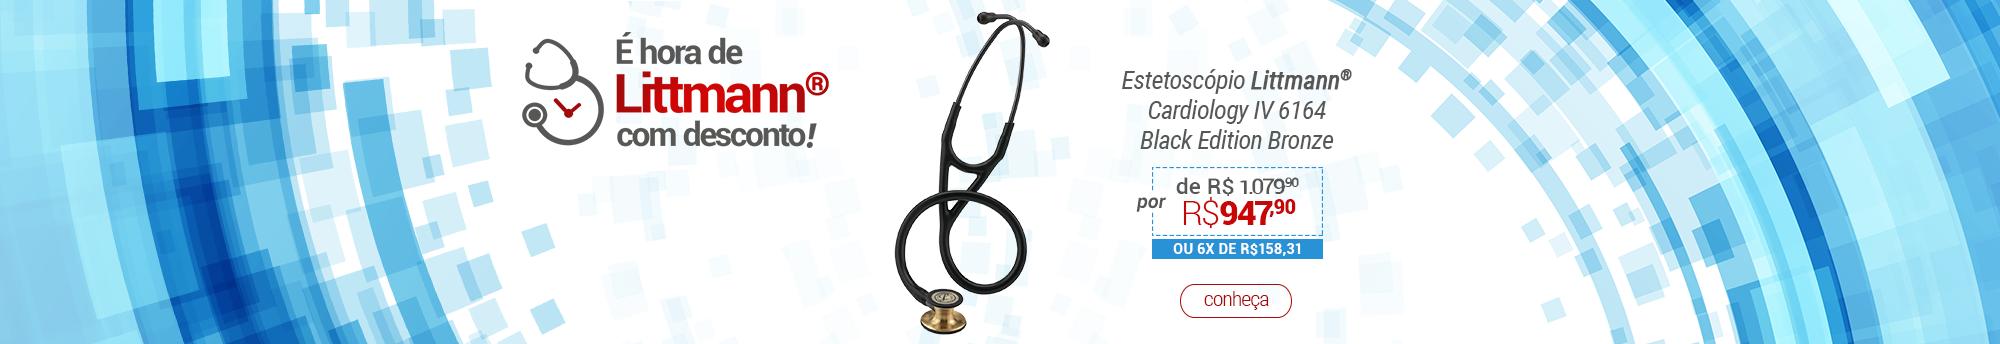 Black Edition Bronze